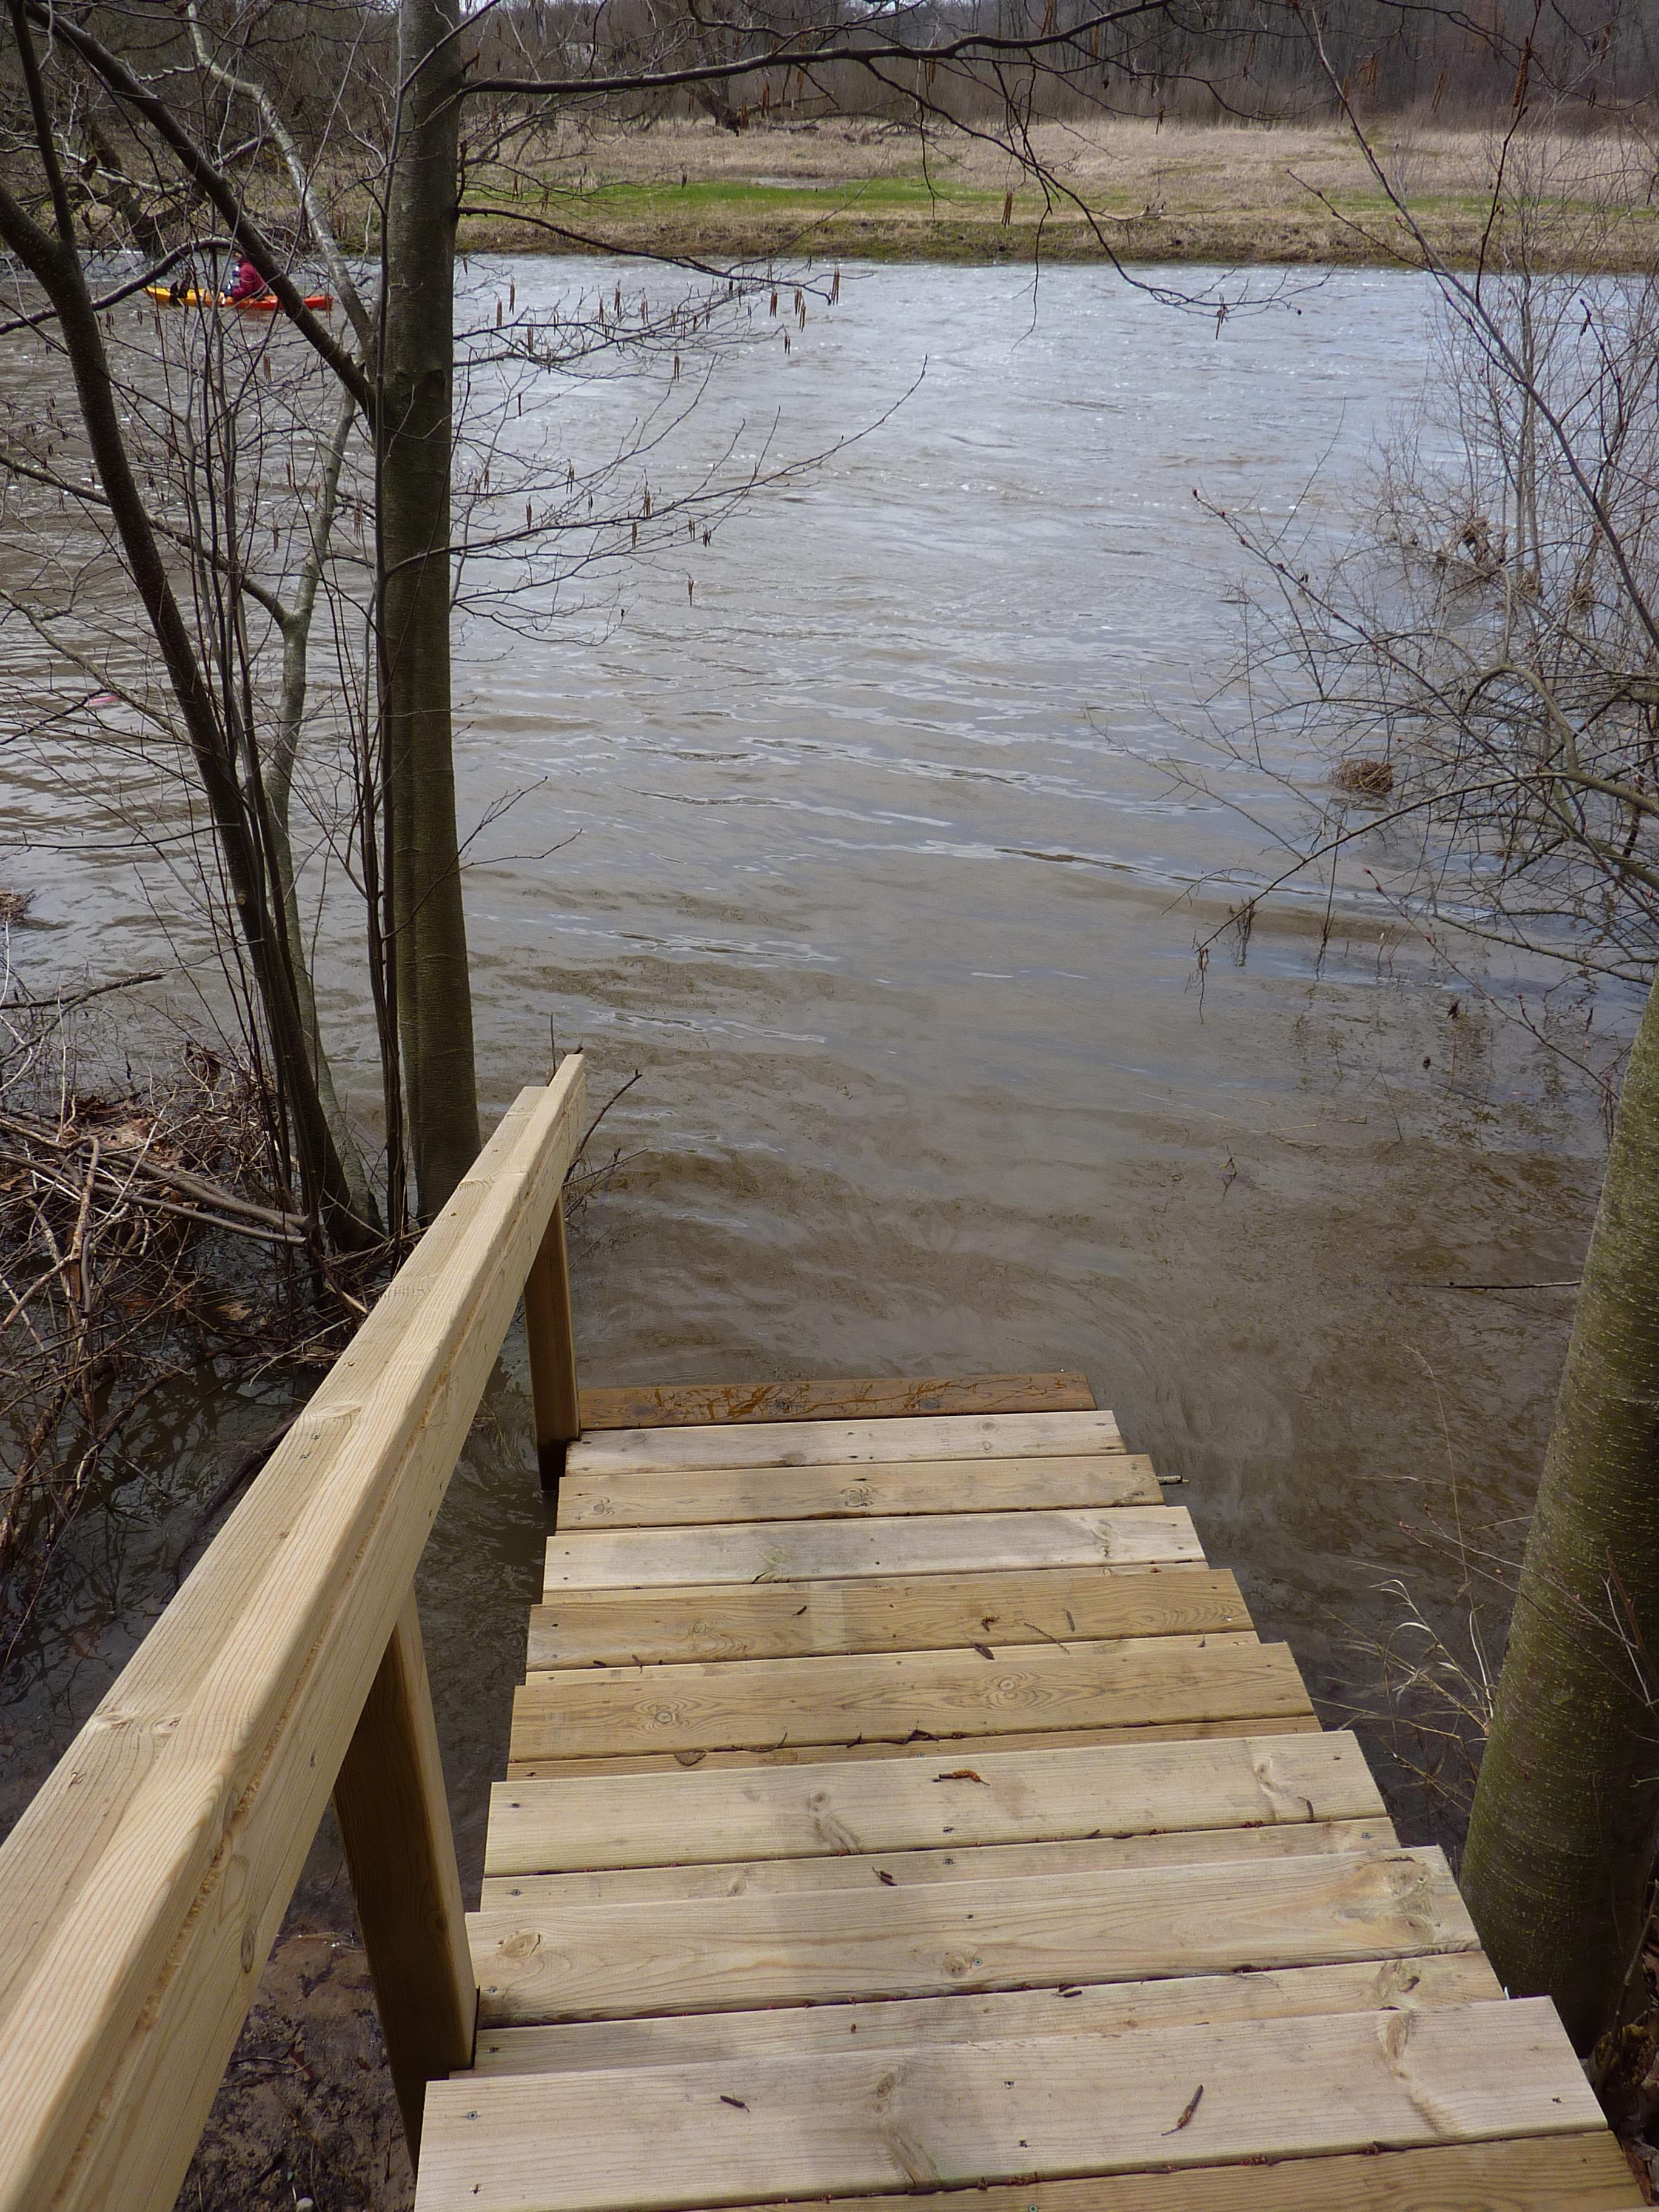 Rogue River Flooding April 20